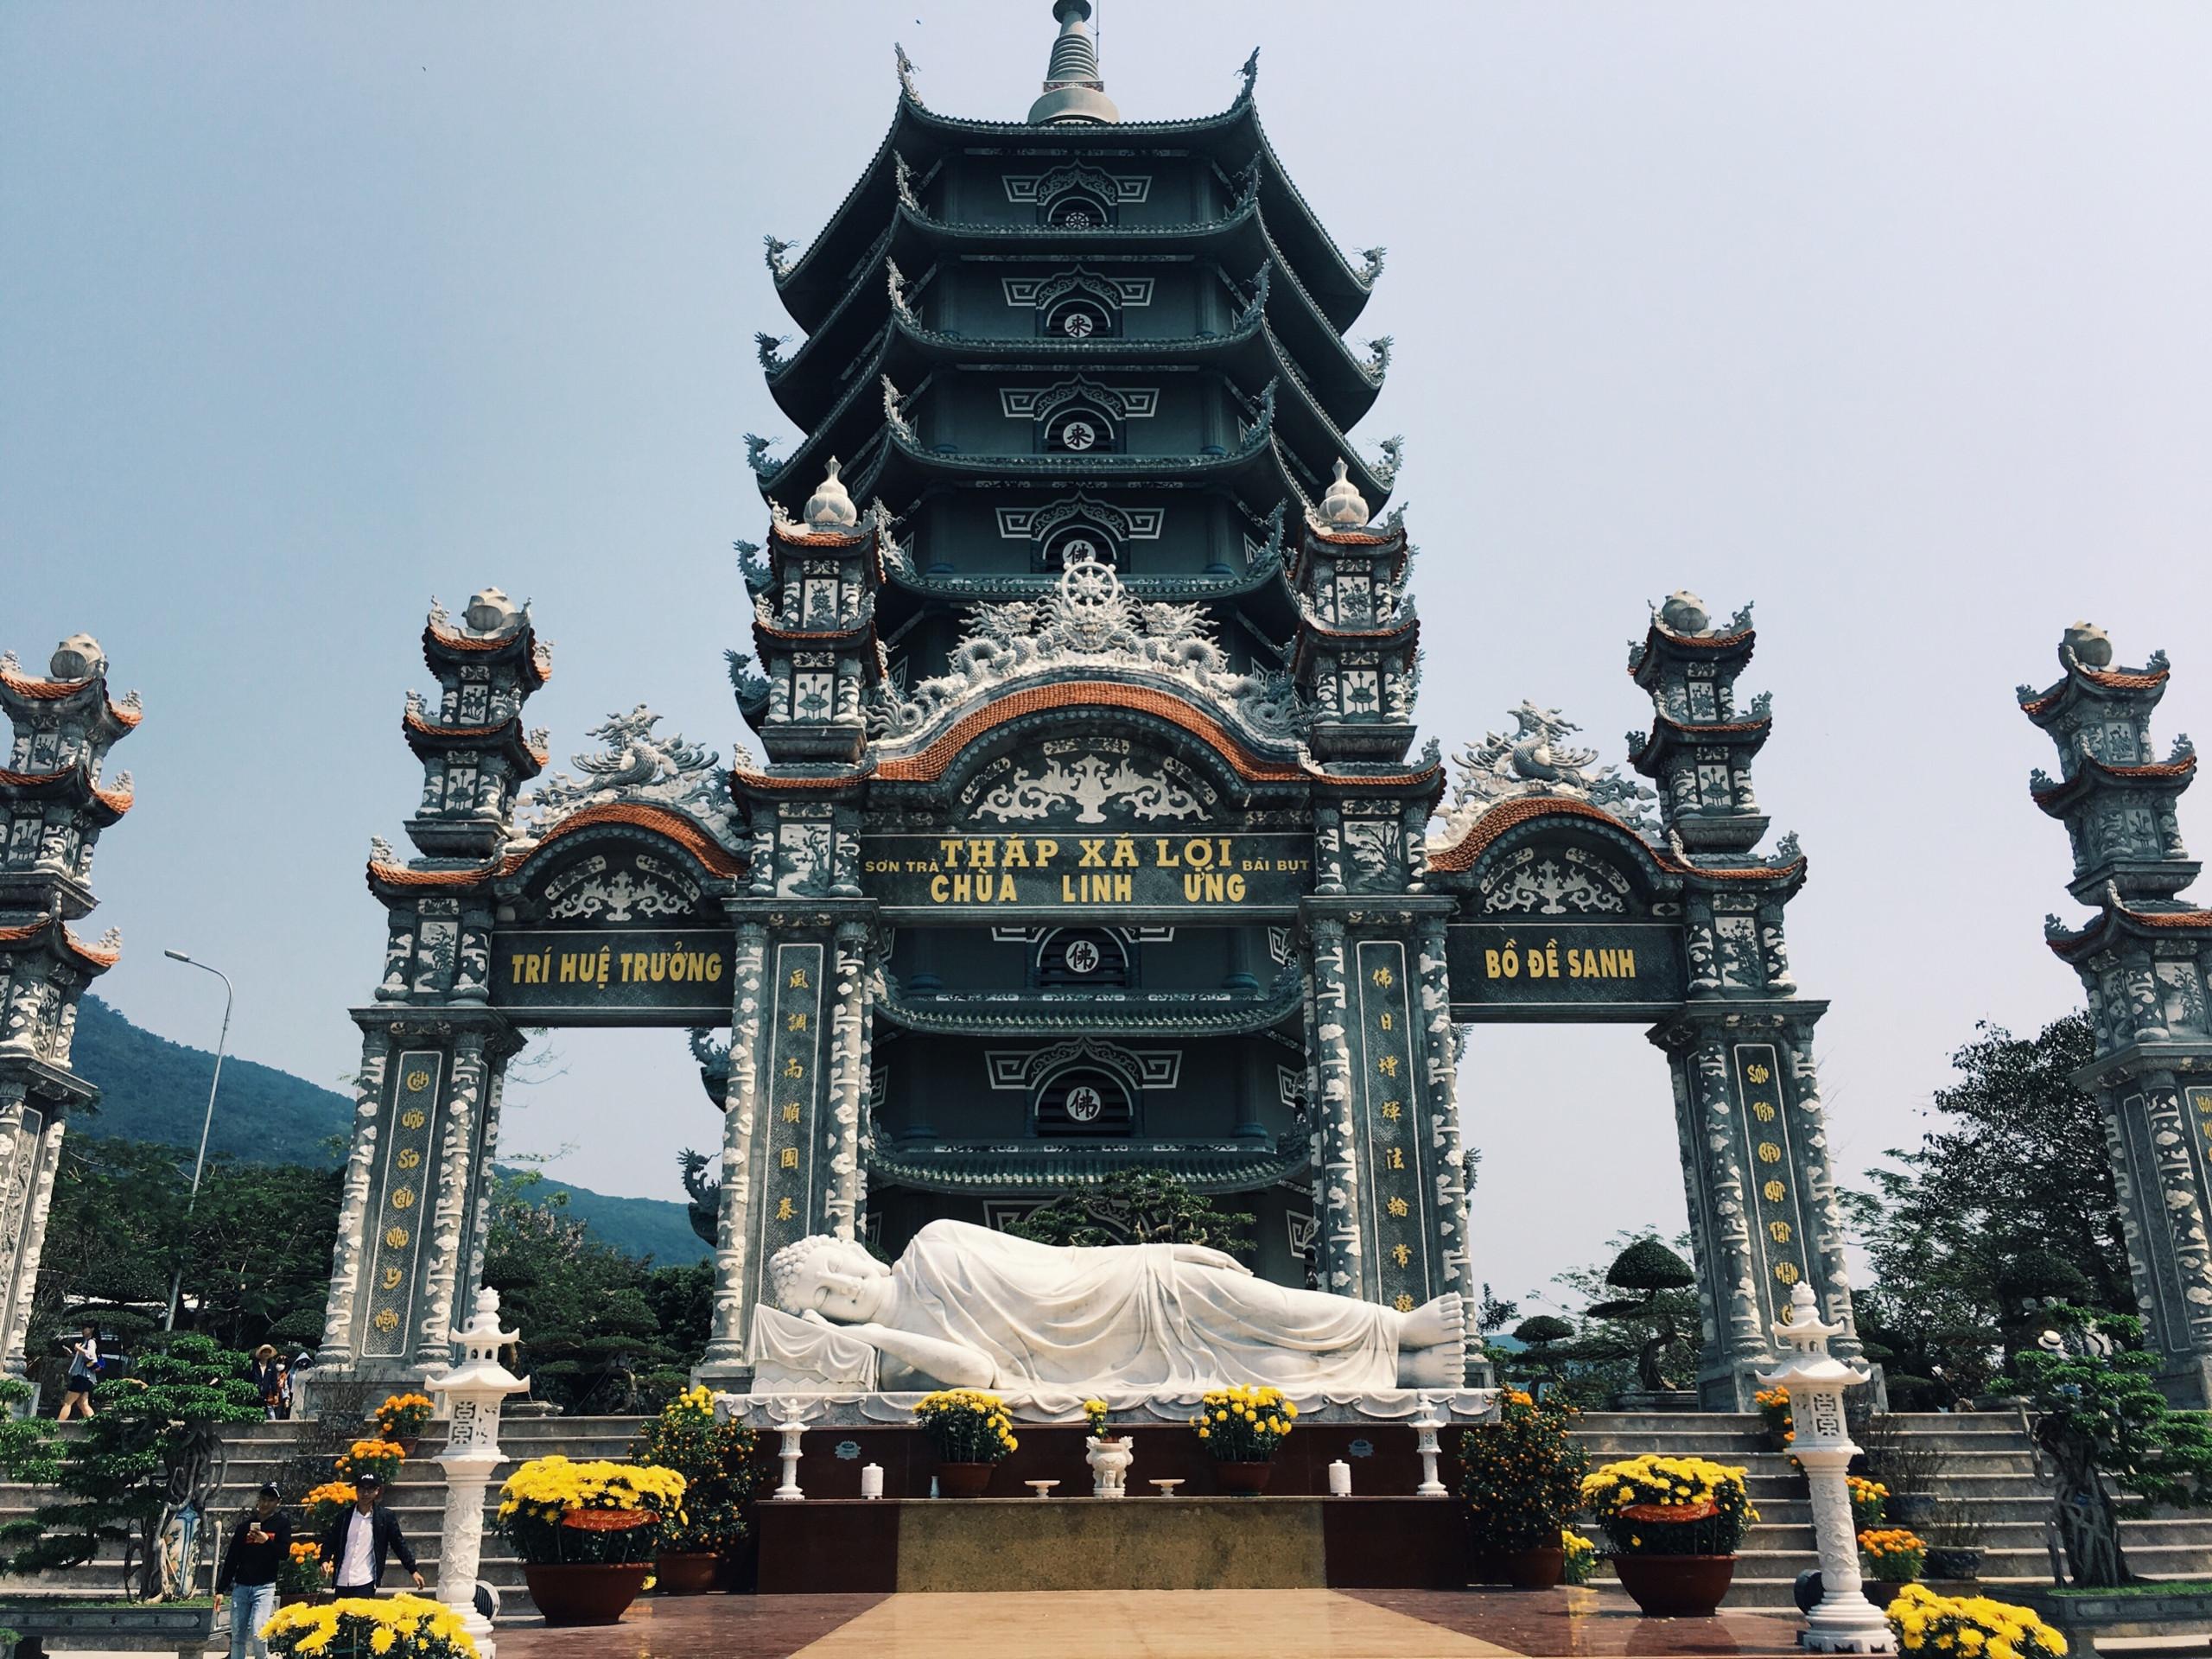 Tháp Xã Lợi